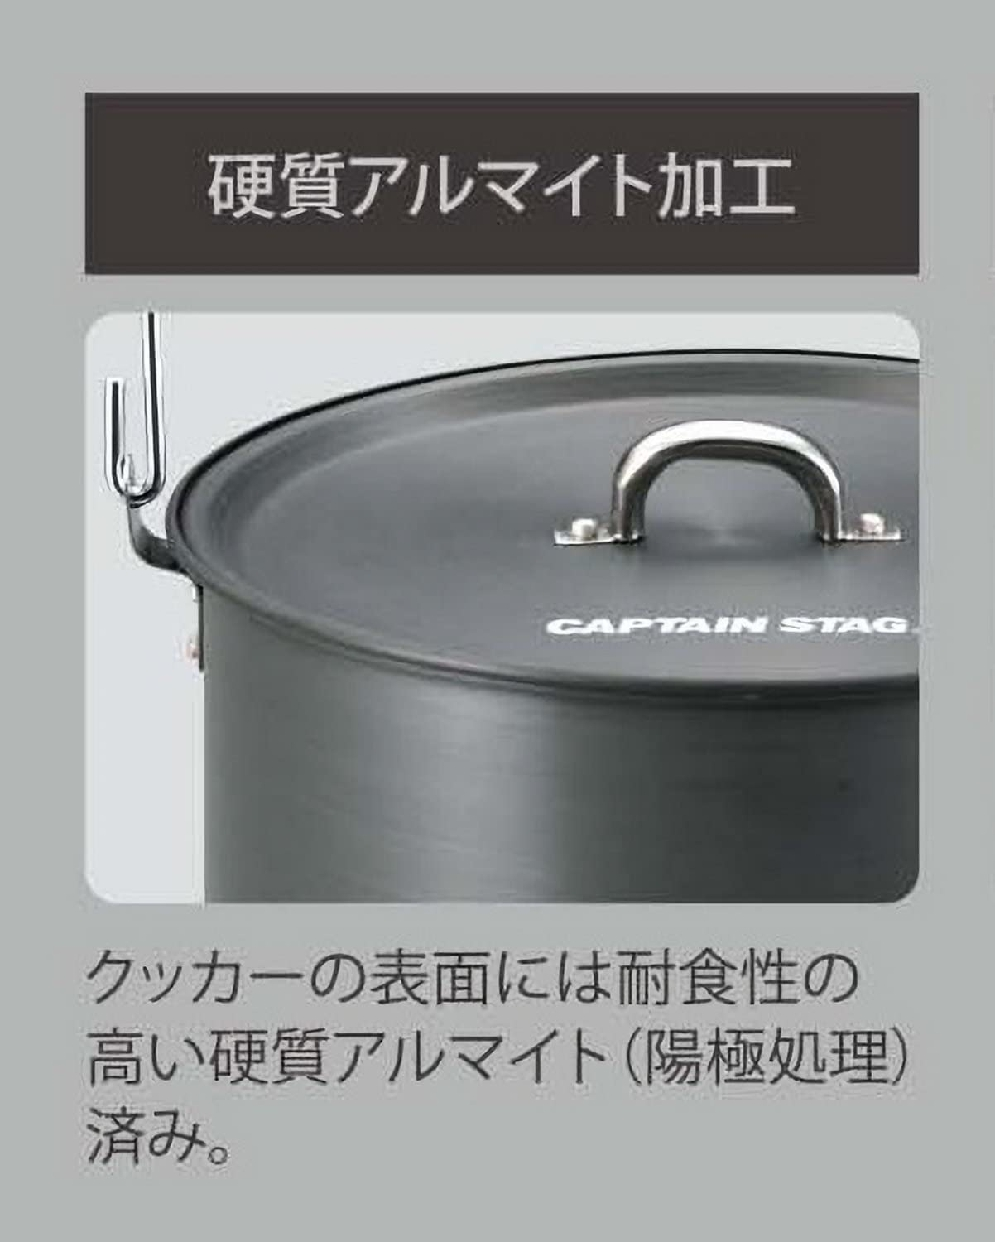 CAPTAIN STAG(キャプテンスタッグ) アルミつる付寸胴鍋20cm UH-4103の商品画像7